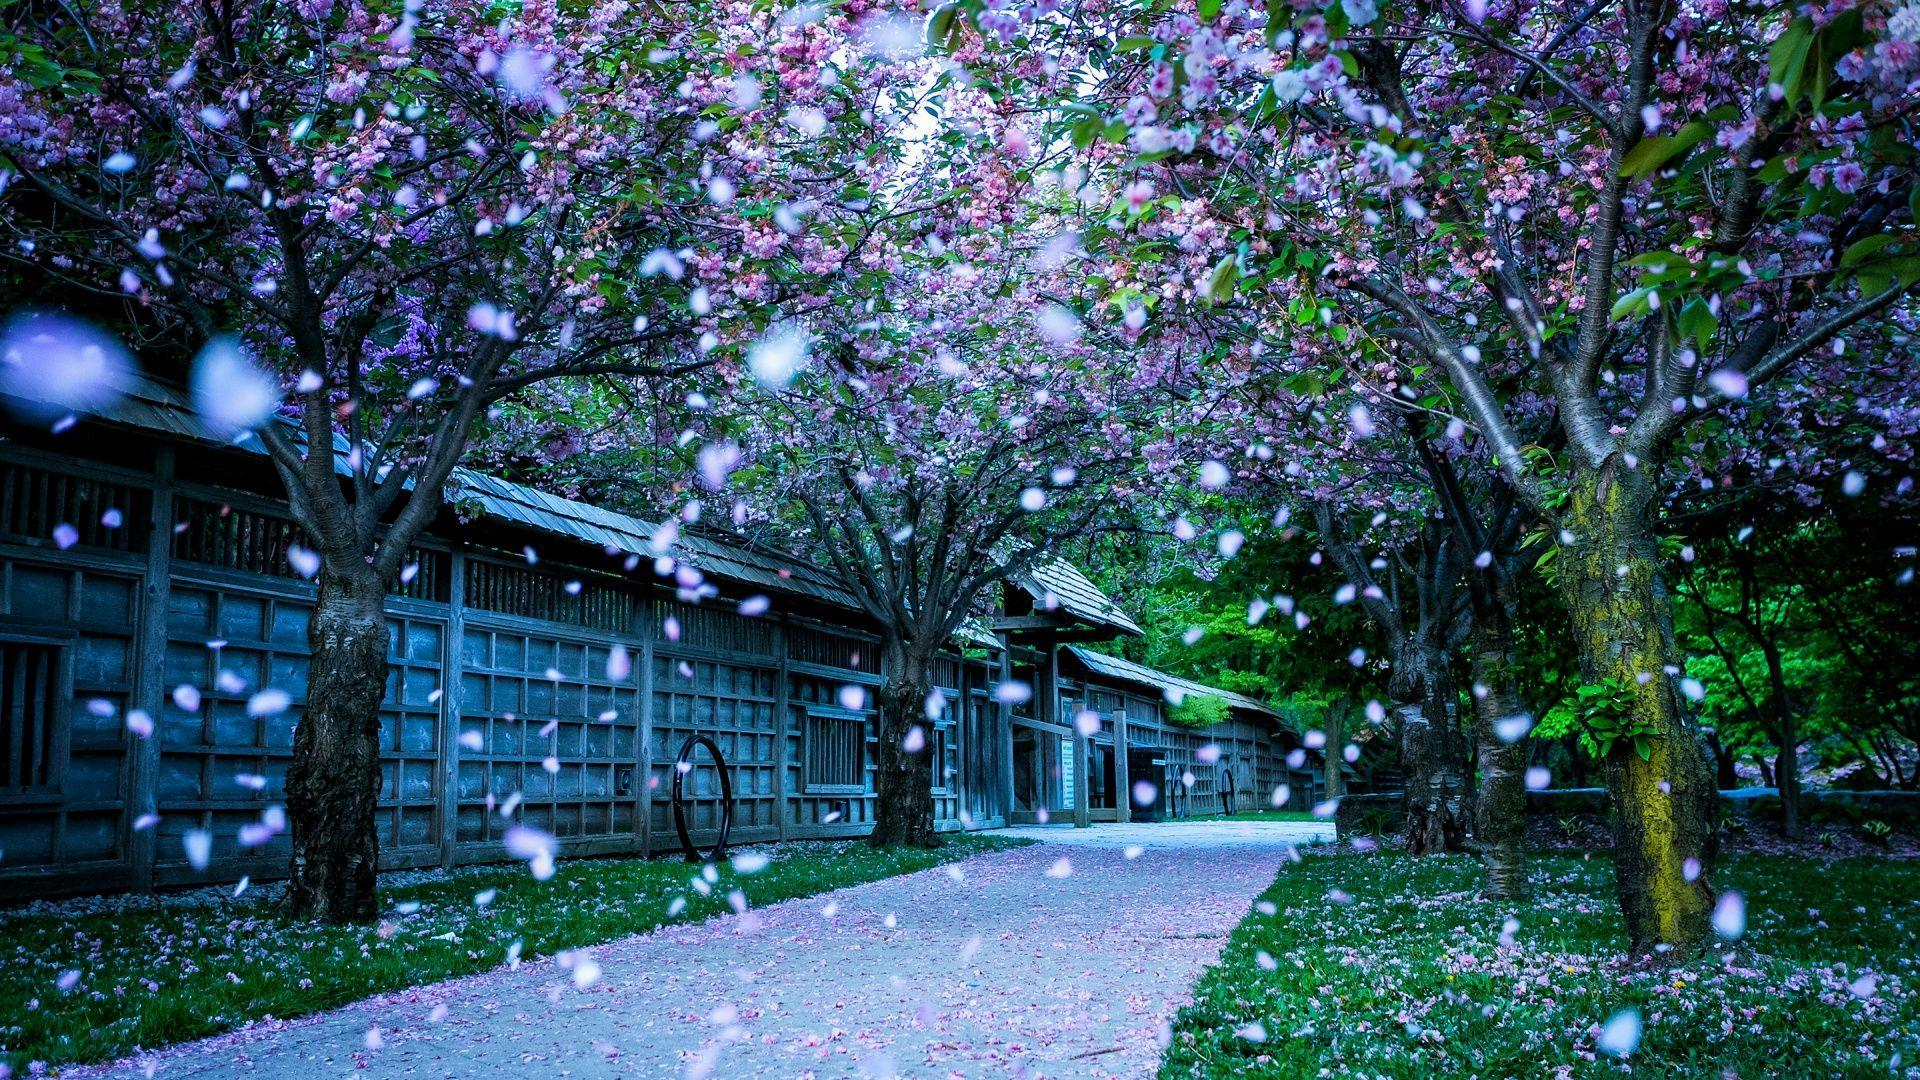 Beautiful Spring Images Download PixelsTalk Full HD P Wallpapers Desktop Backgrounds 1920x1080